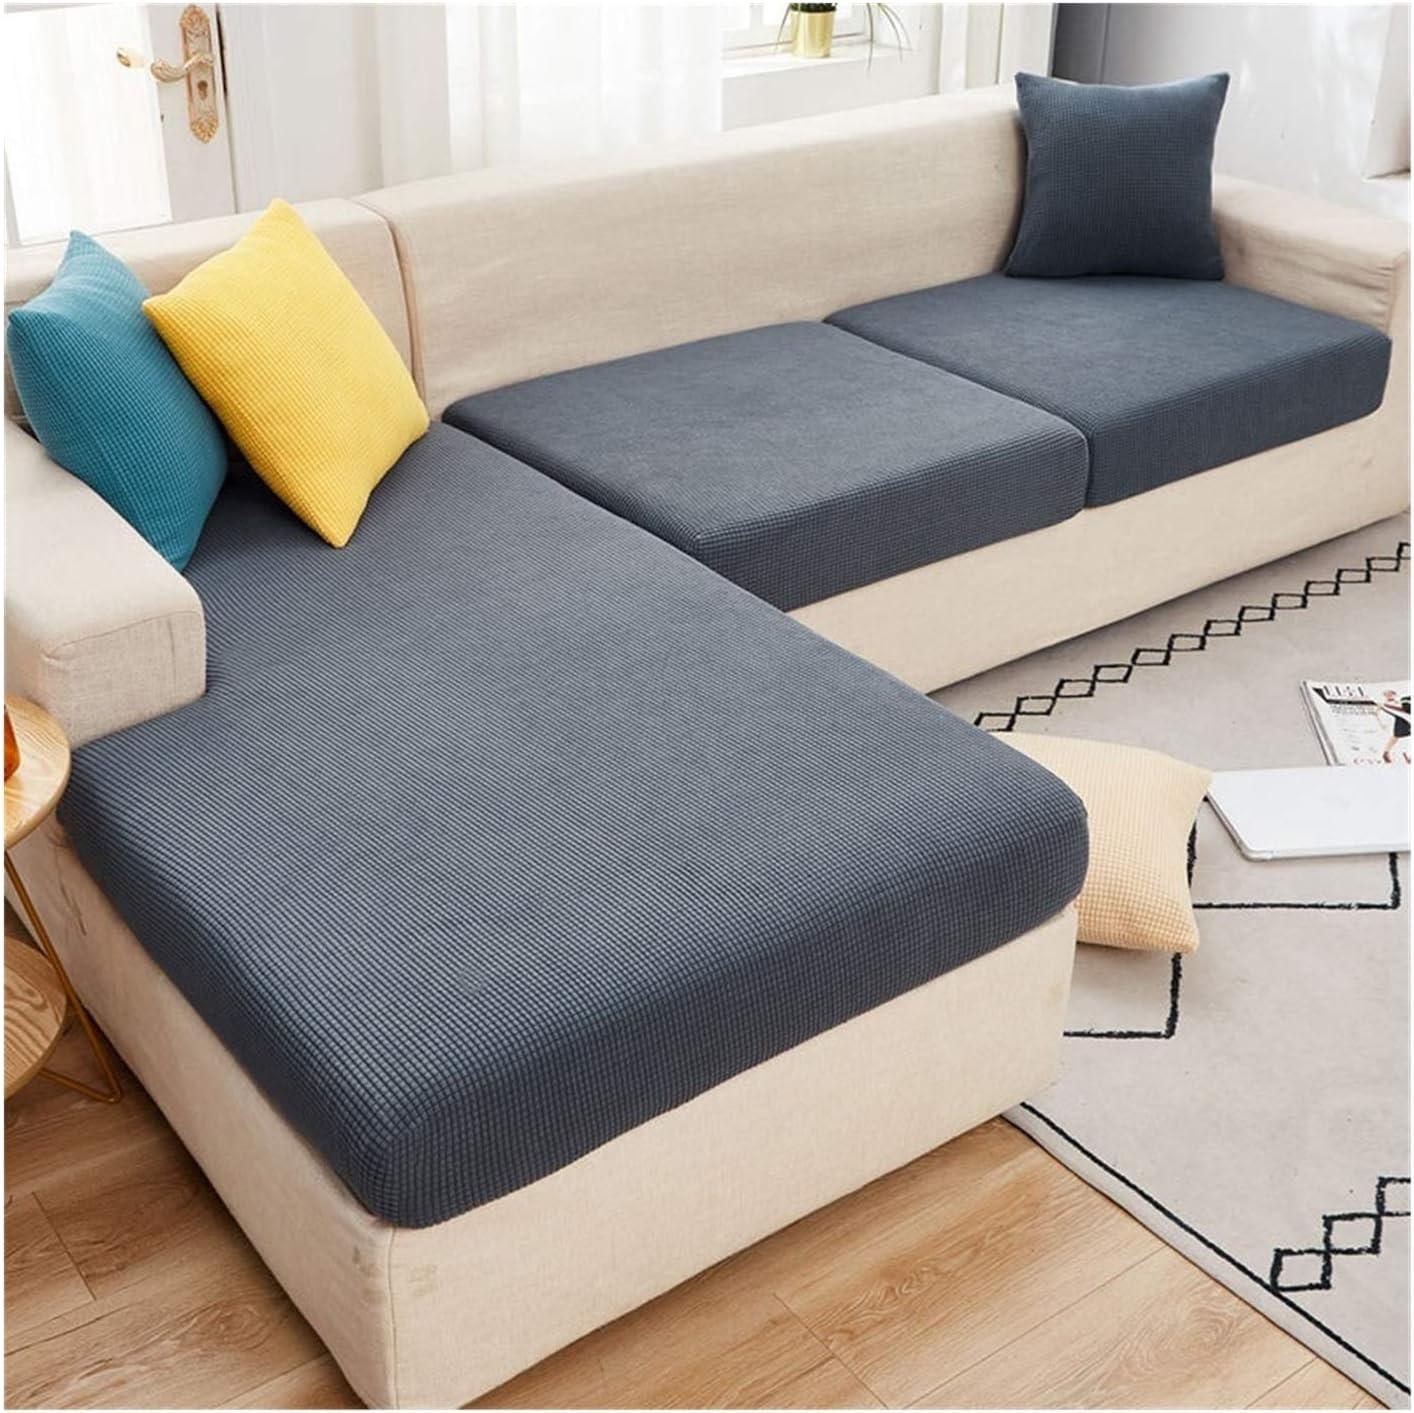 JPMSB Sofa Seat Cushion Cover Furniture Pro 1 year warranty Solid Elastic mart Color